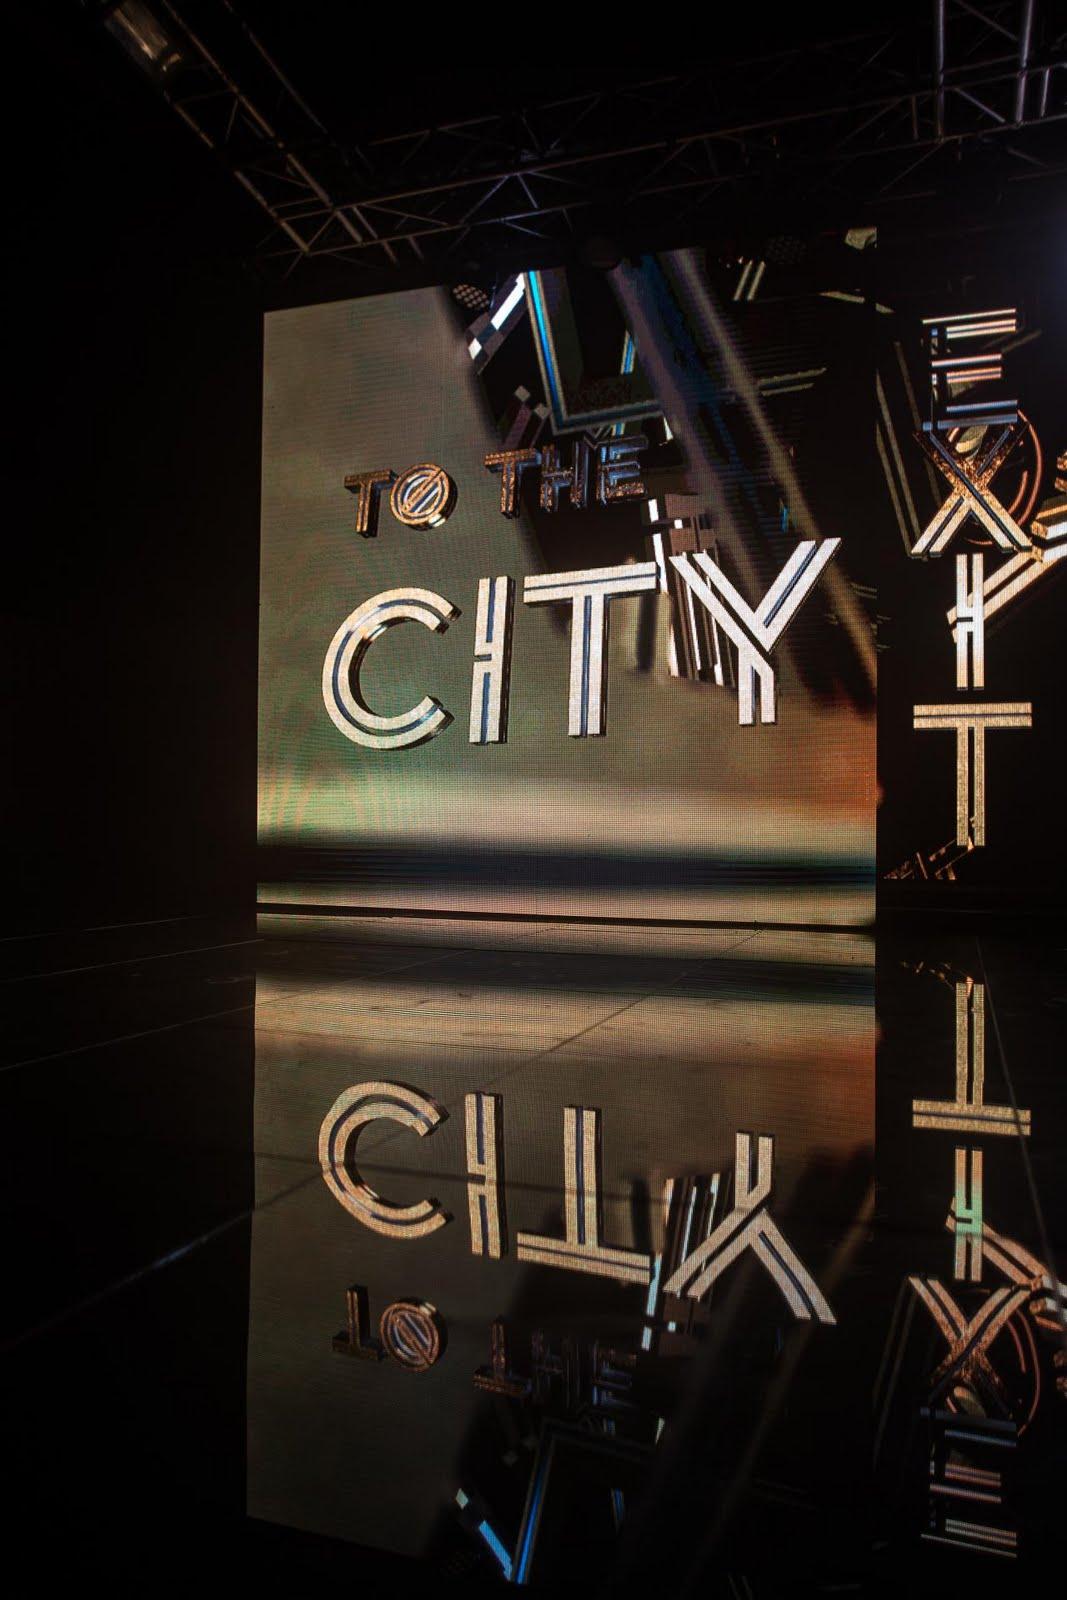 Exit to the city x Bubblehard 2016 - bubblehard%2Bx%2Bettc%2B01.jpg